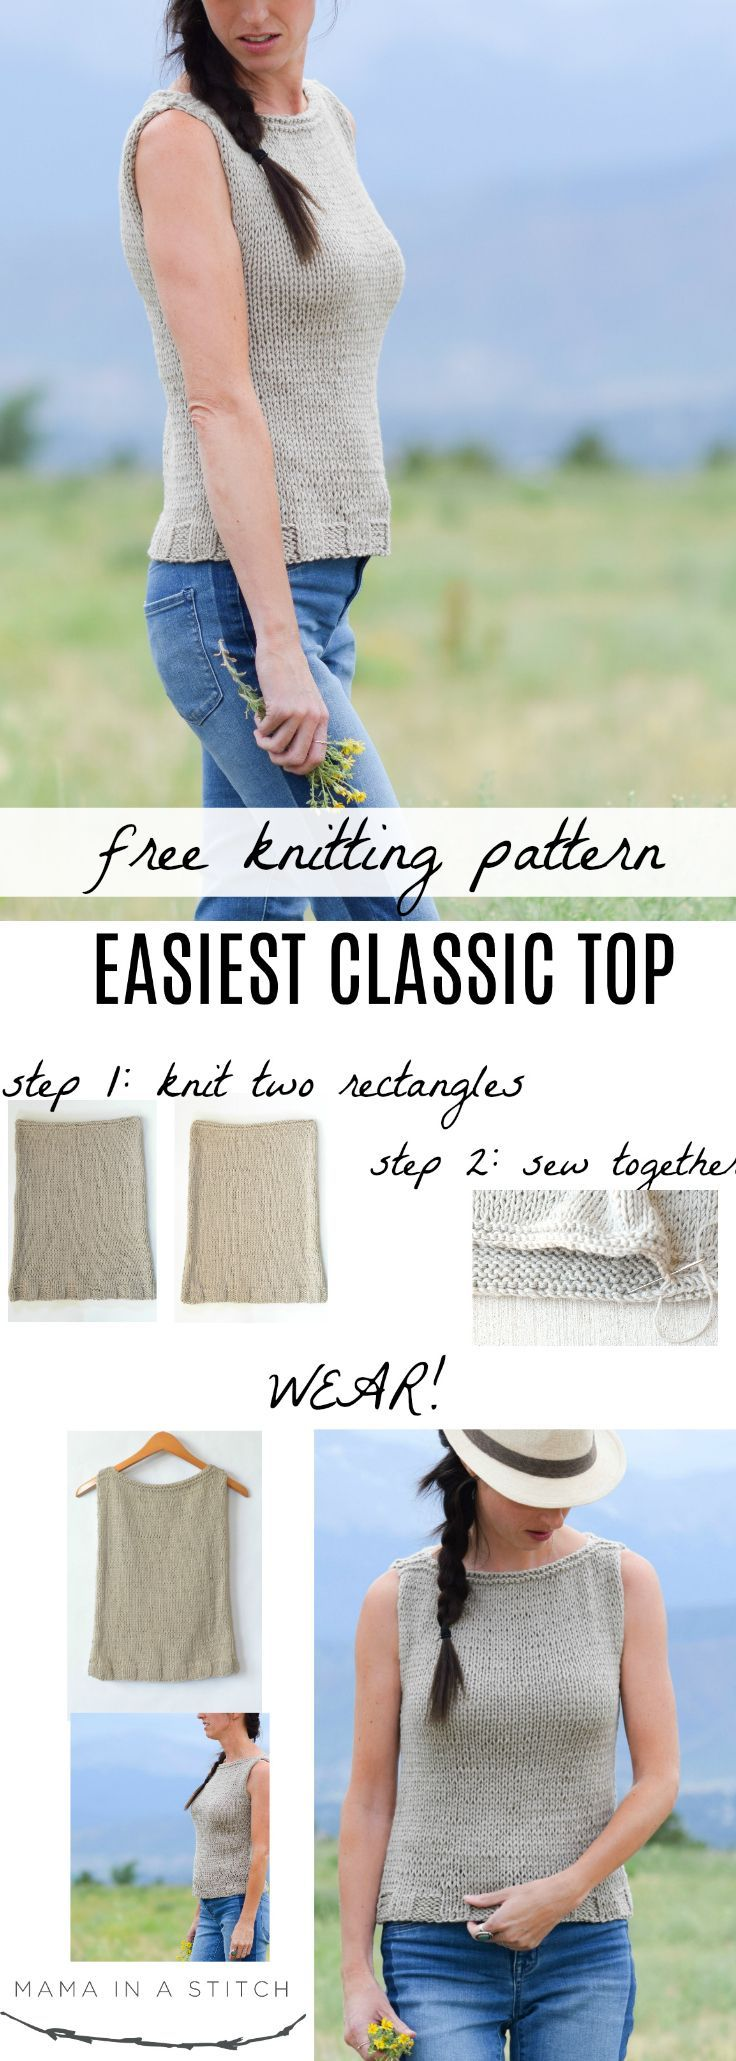 3836 best Pretty Knitting Patterns images on Pinterest | Knitting ...